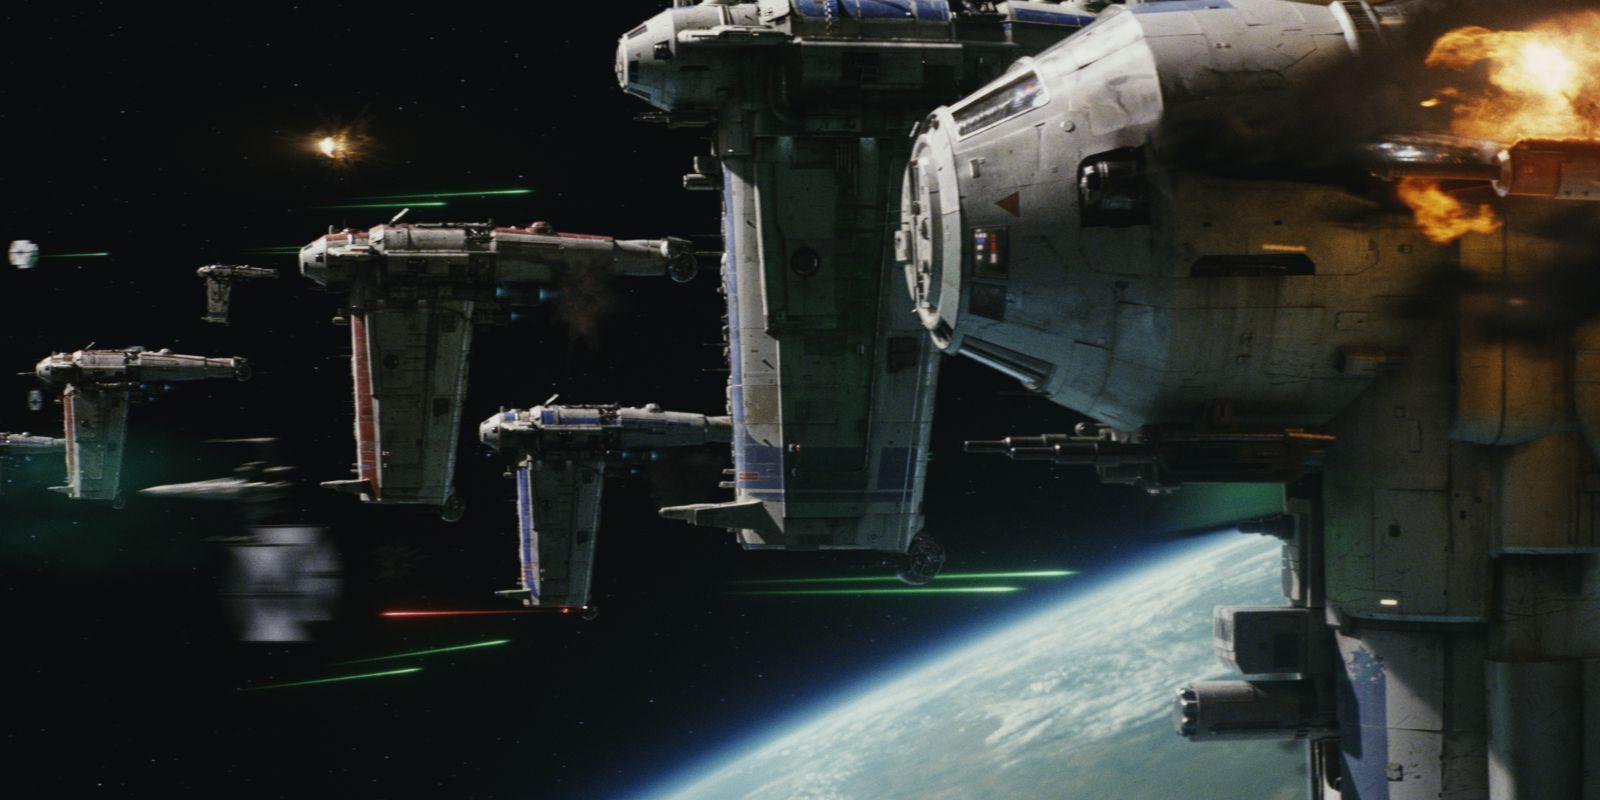 Star Wars The Last Jedi teaser trailer - Space battle